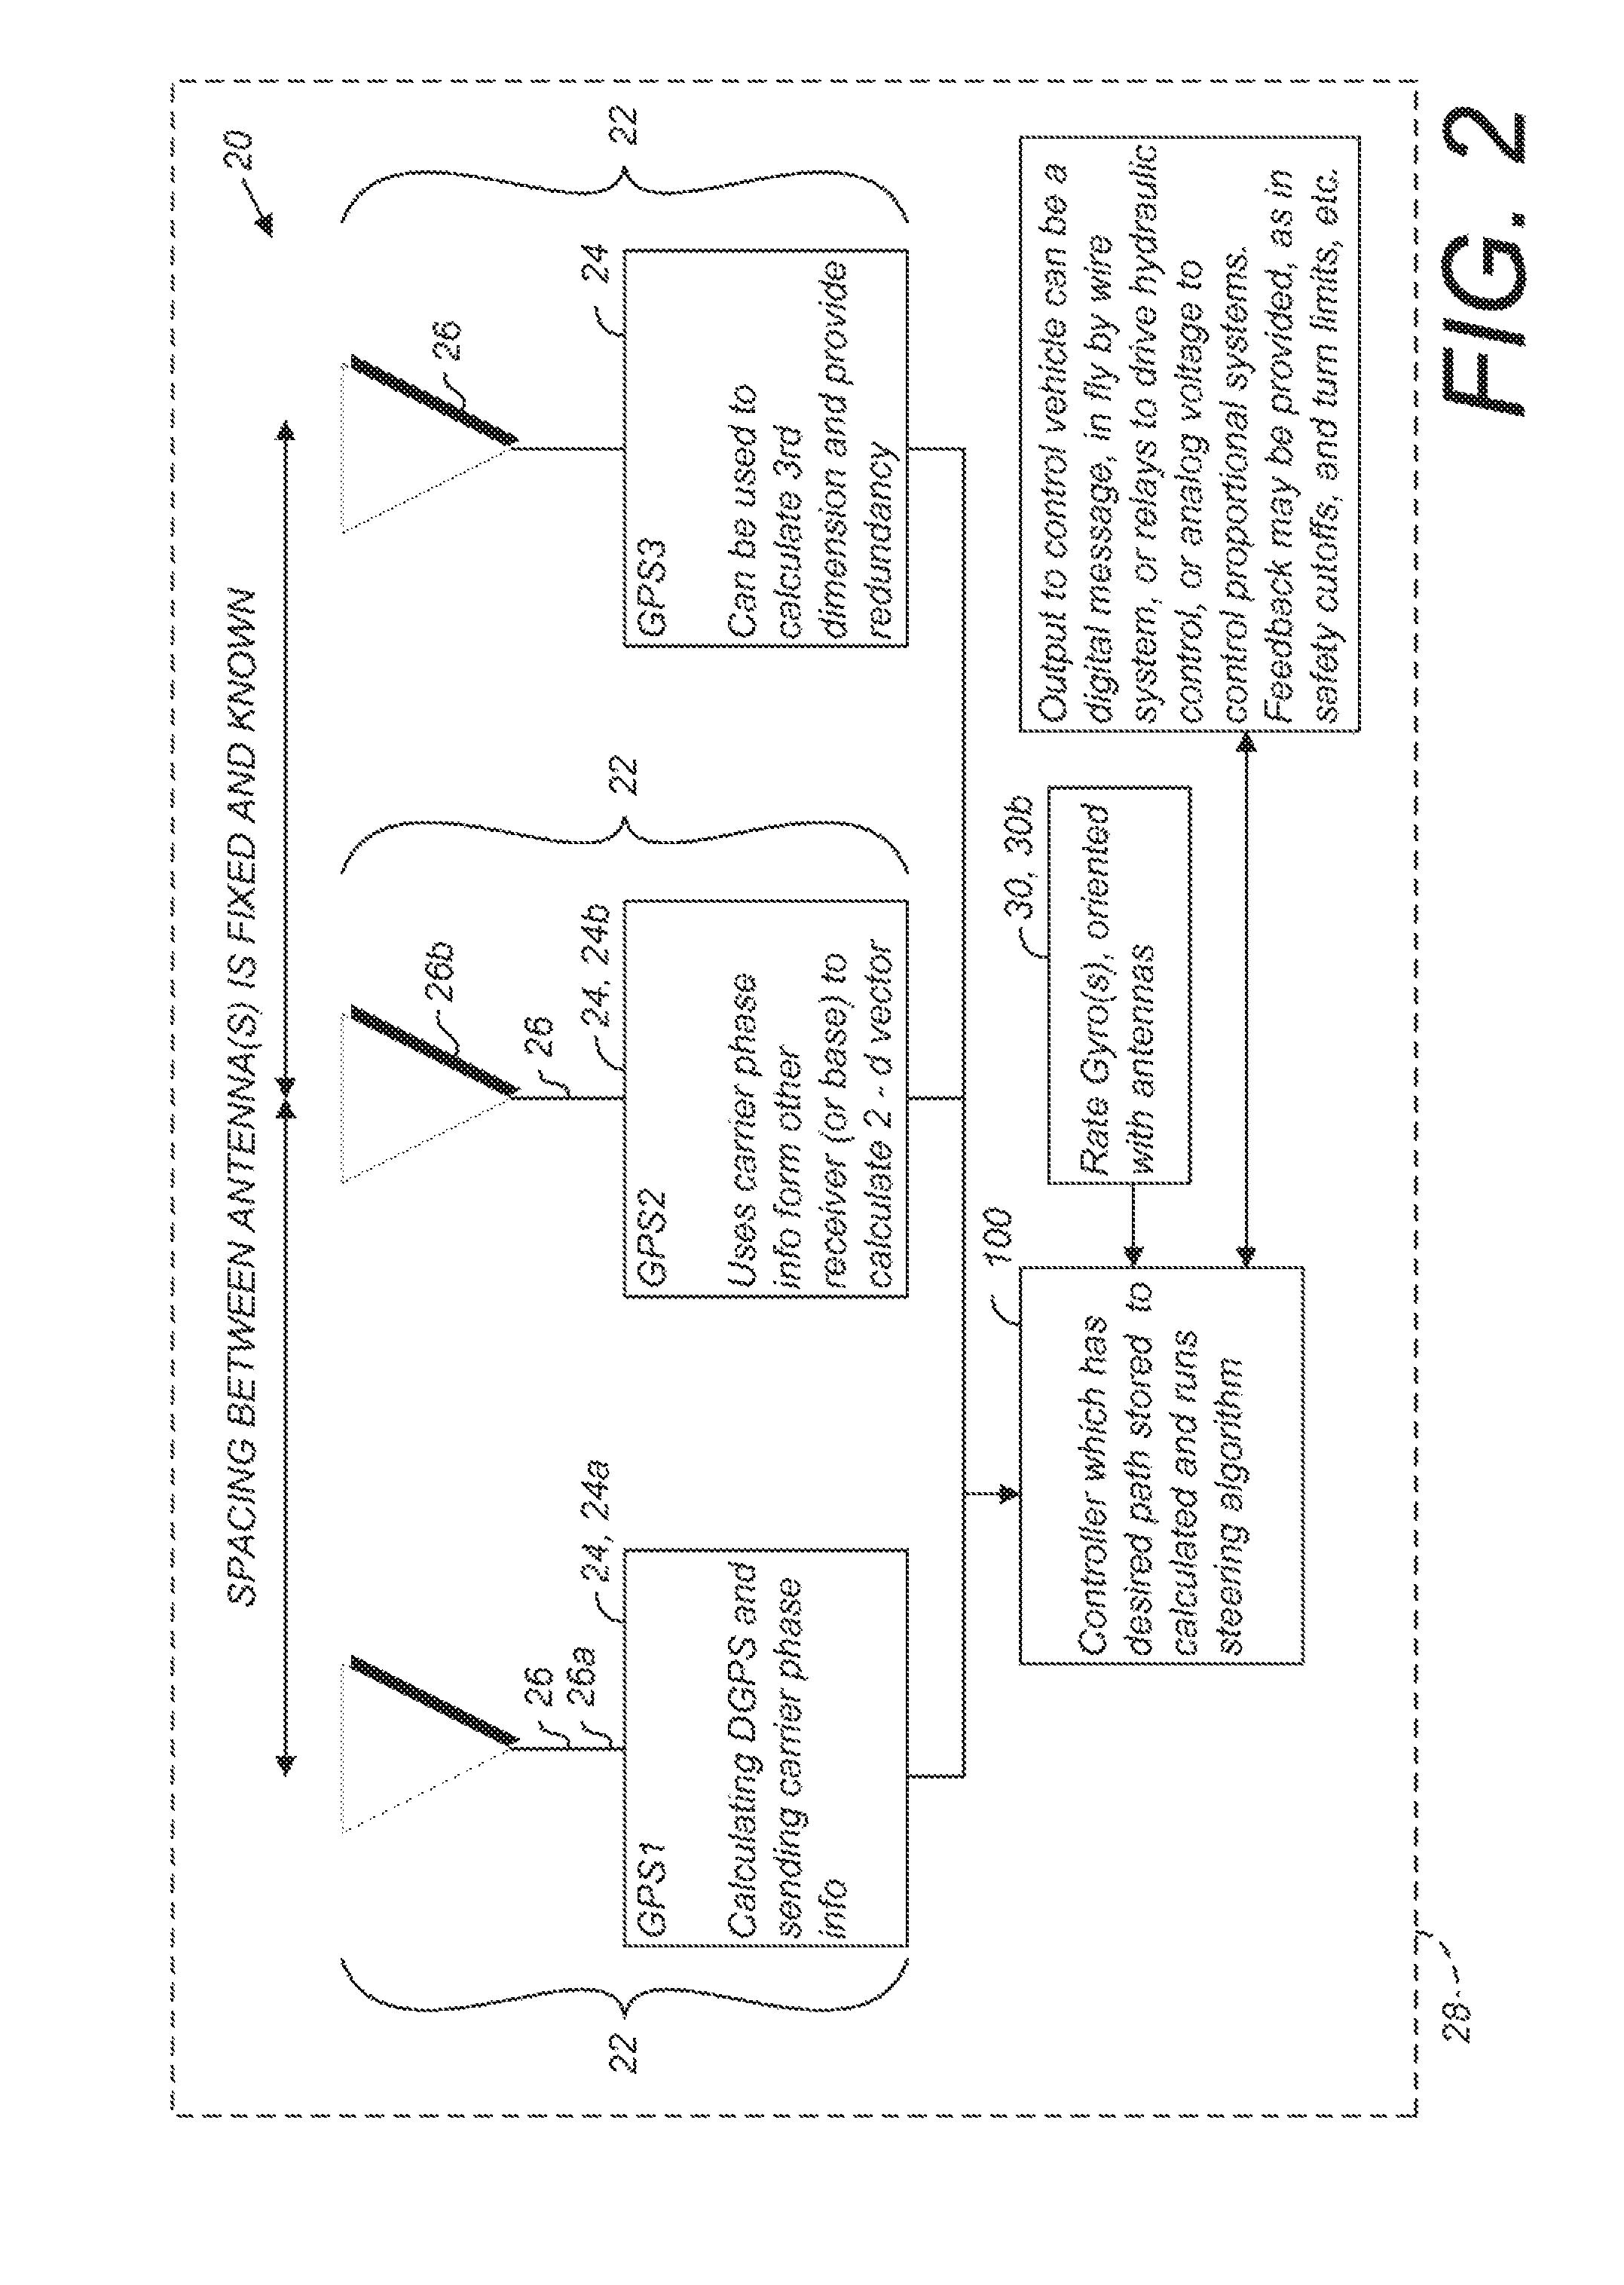 Patent Us 9886038 B2 Likewise John Deere 310 Backhoe Brake Diagram Furthermore Images